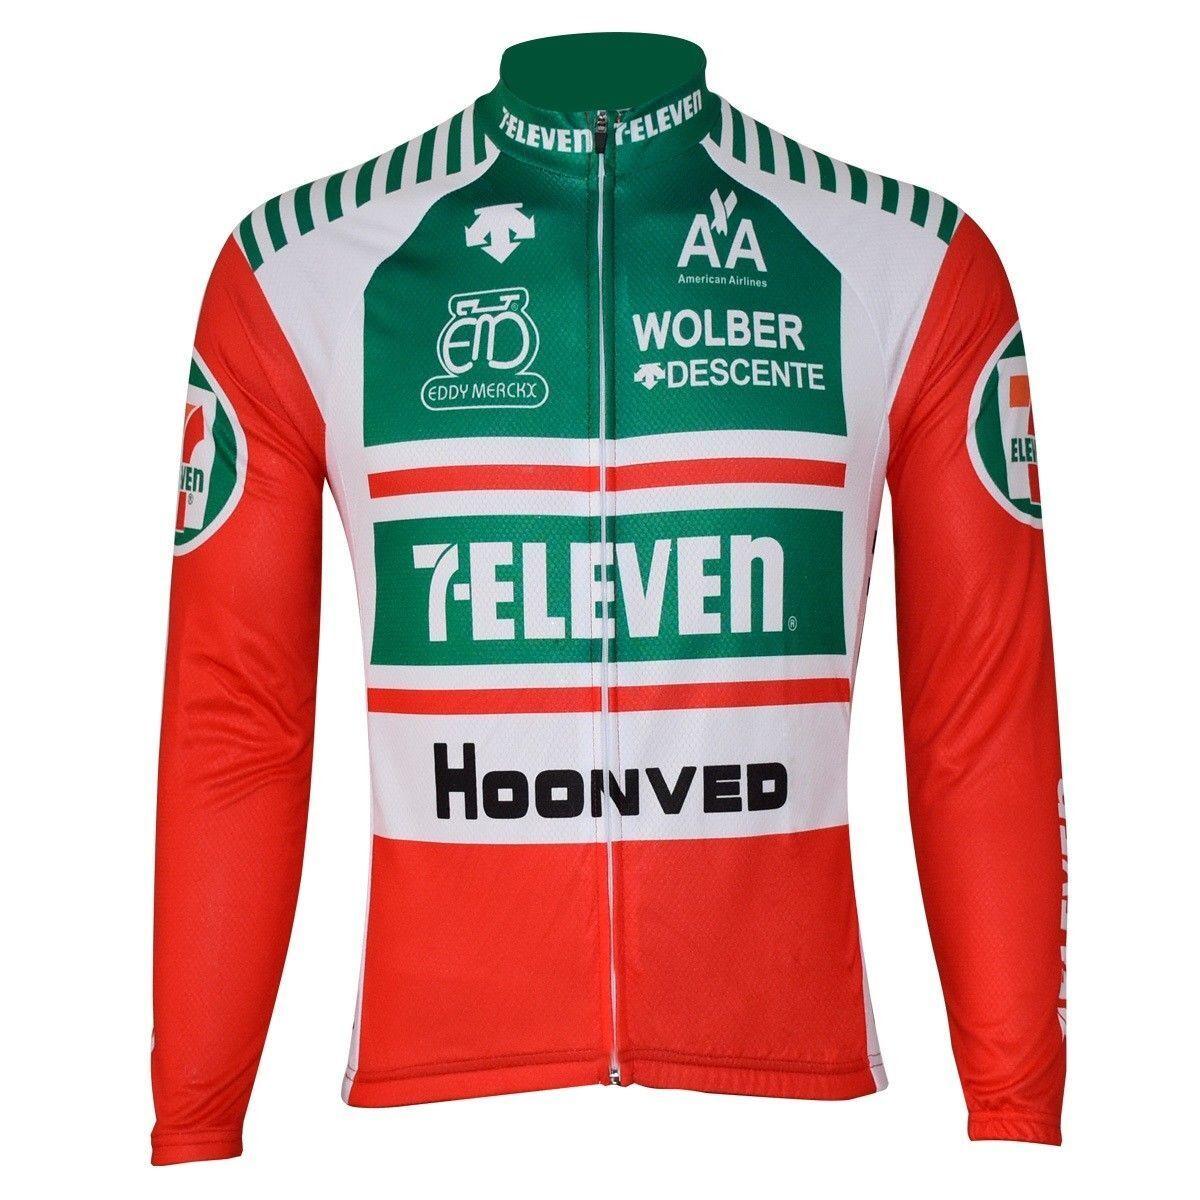 7 Eleven 1981 Cycling Jersey Retro Road Men Pro Clothing MTB Long Sleeve Bike